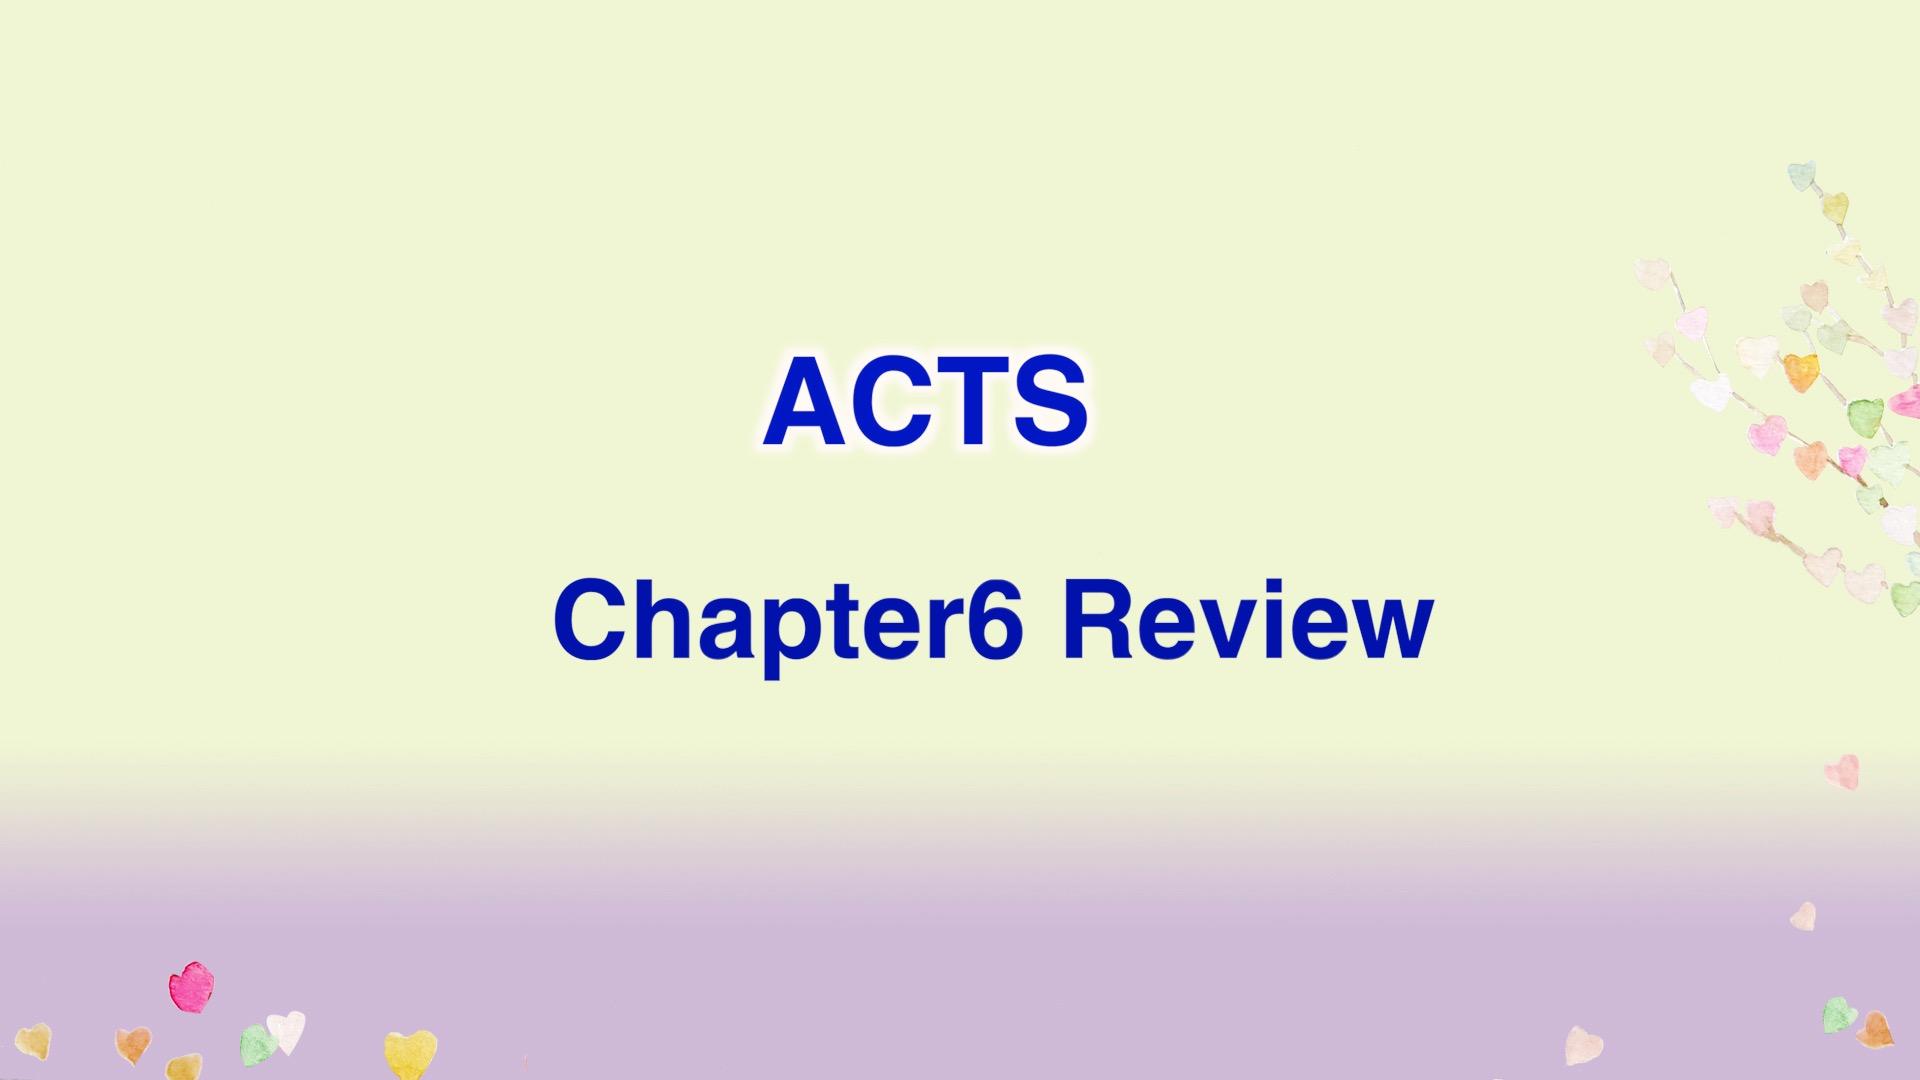 Leena's Bible English-Acts Chap. 6, Review